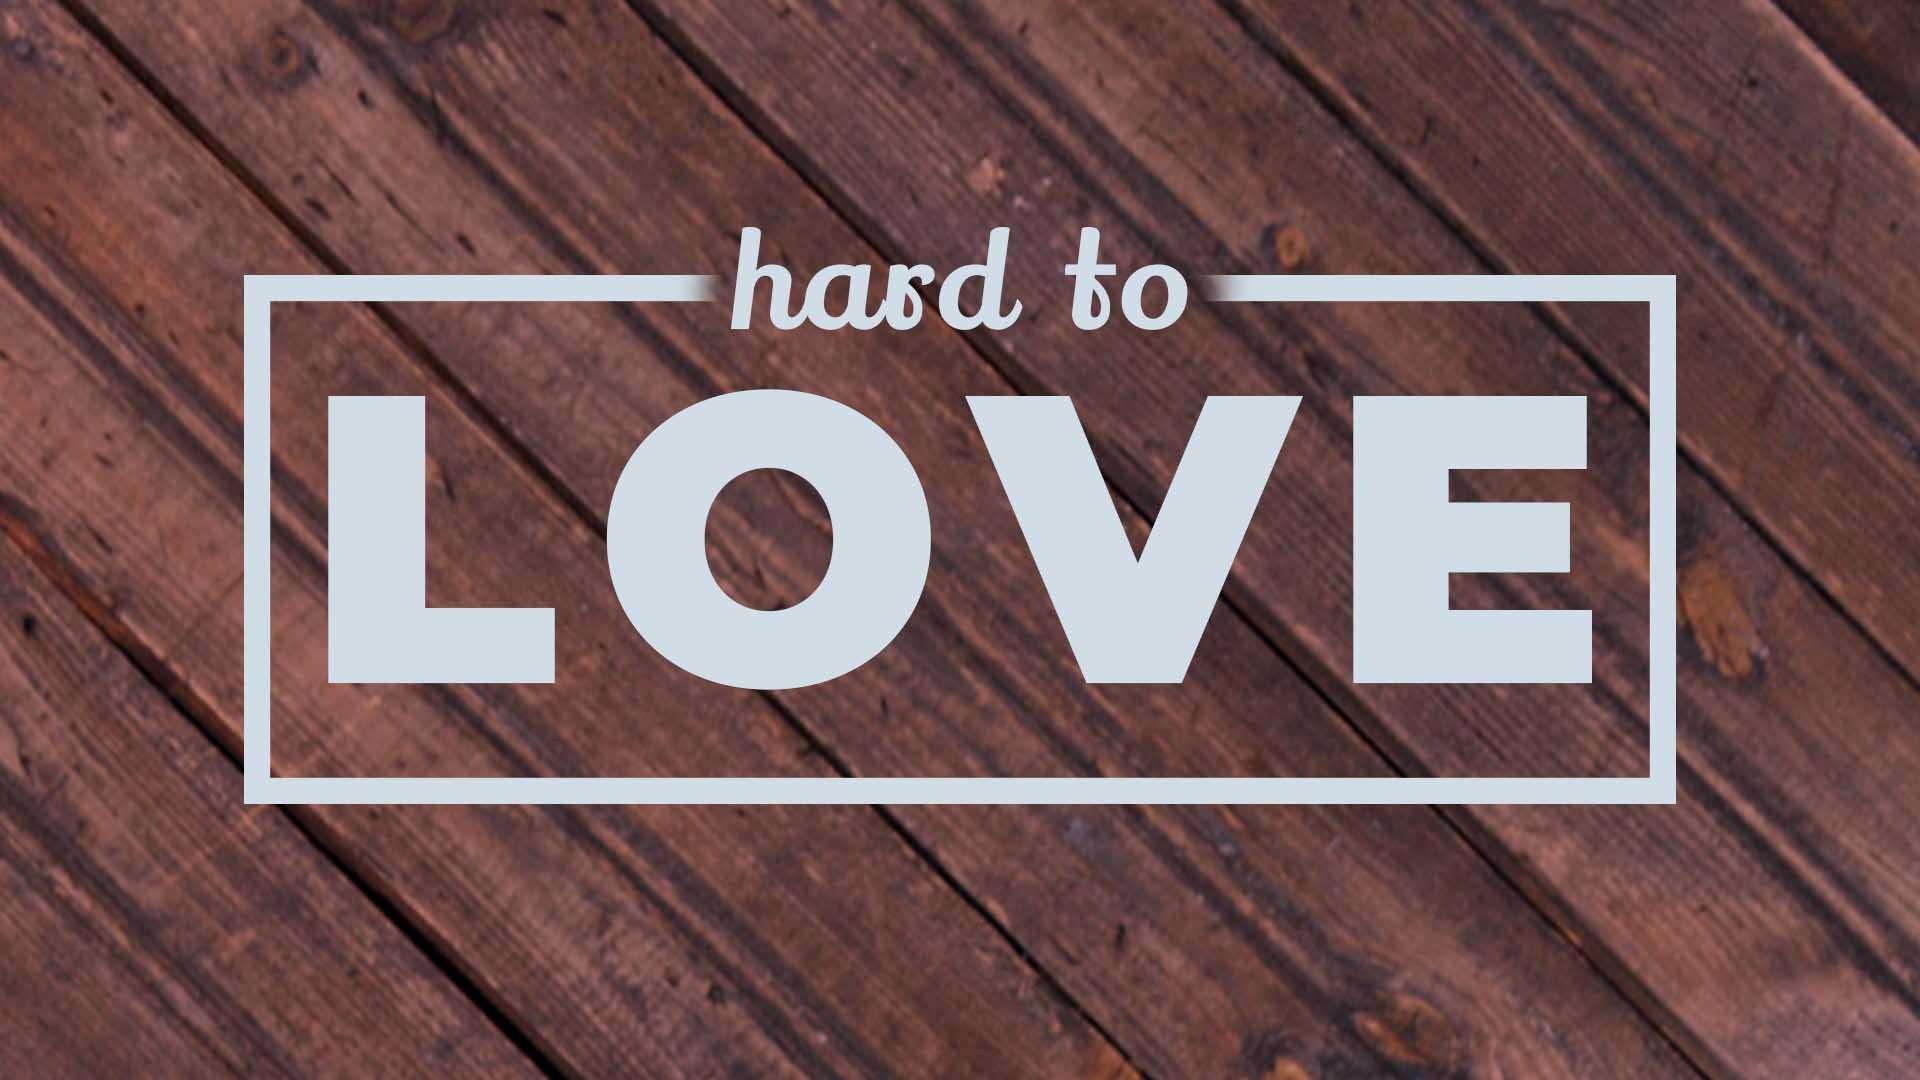 hard to love.jpg